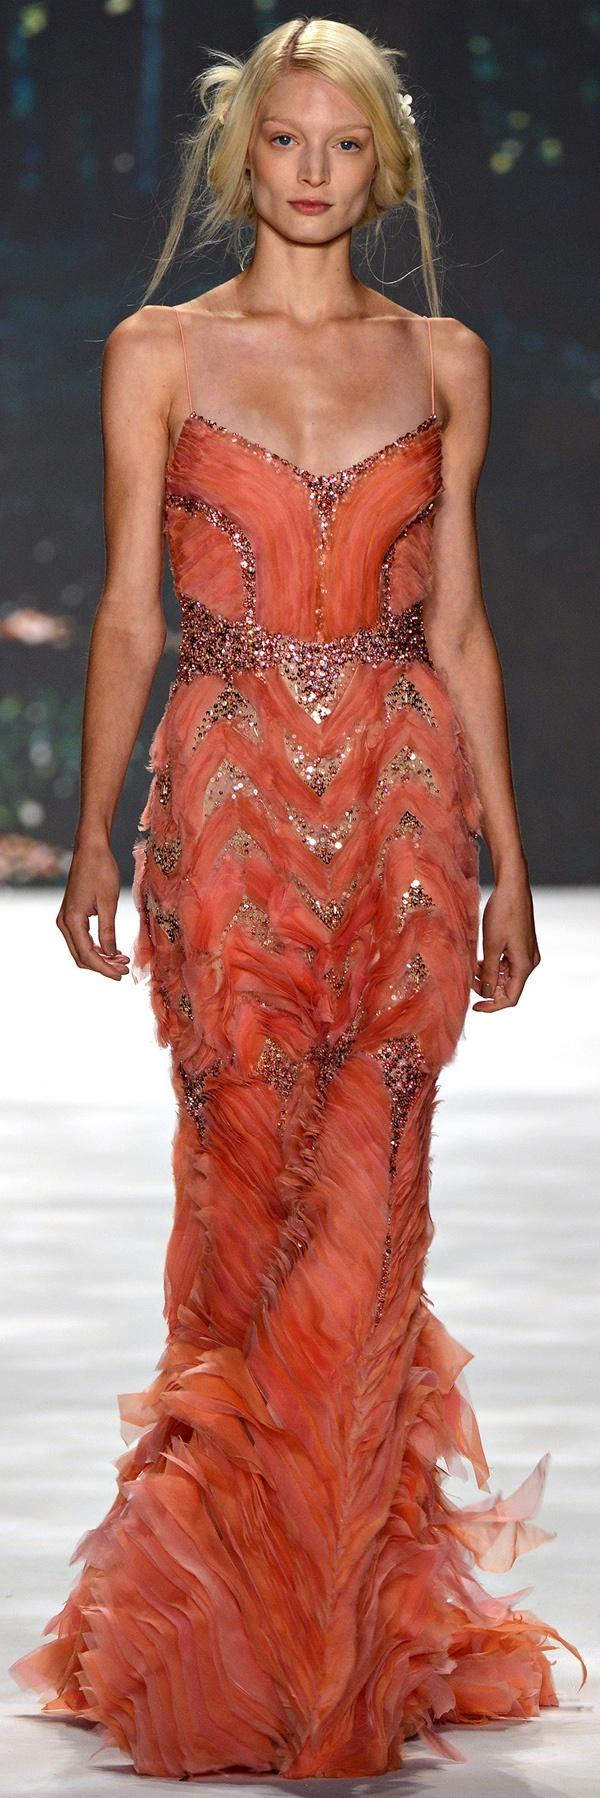 #Badgley Mischka Spring Summer 2013 Ready-To-Wear collection